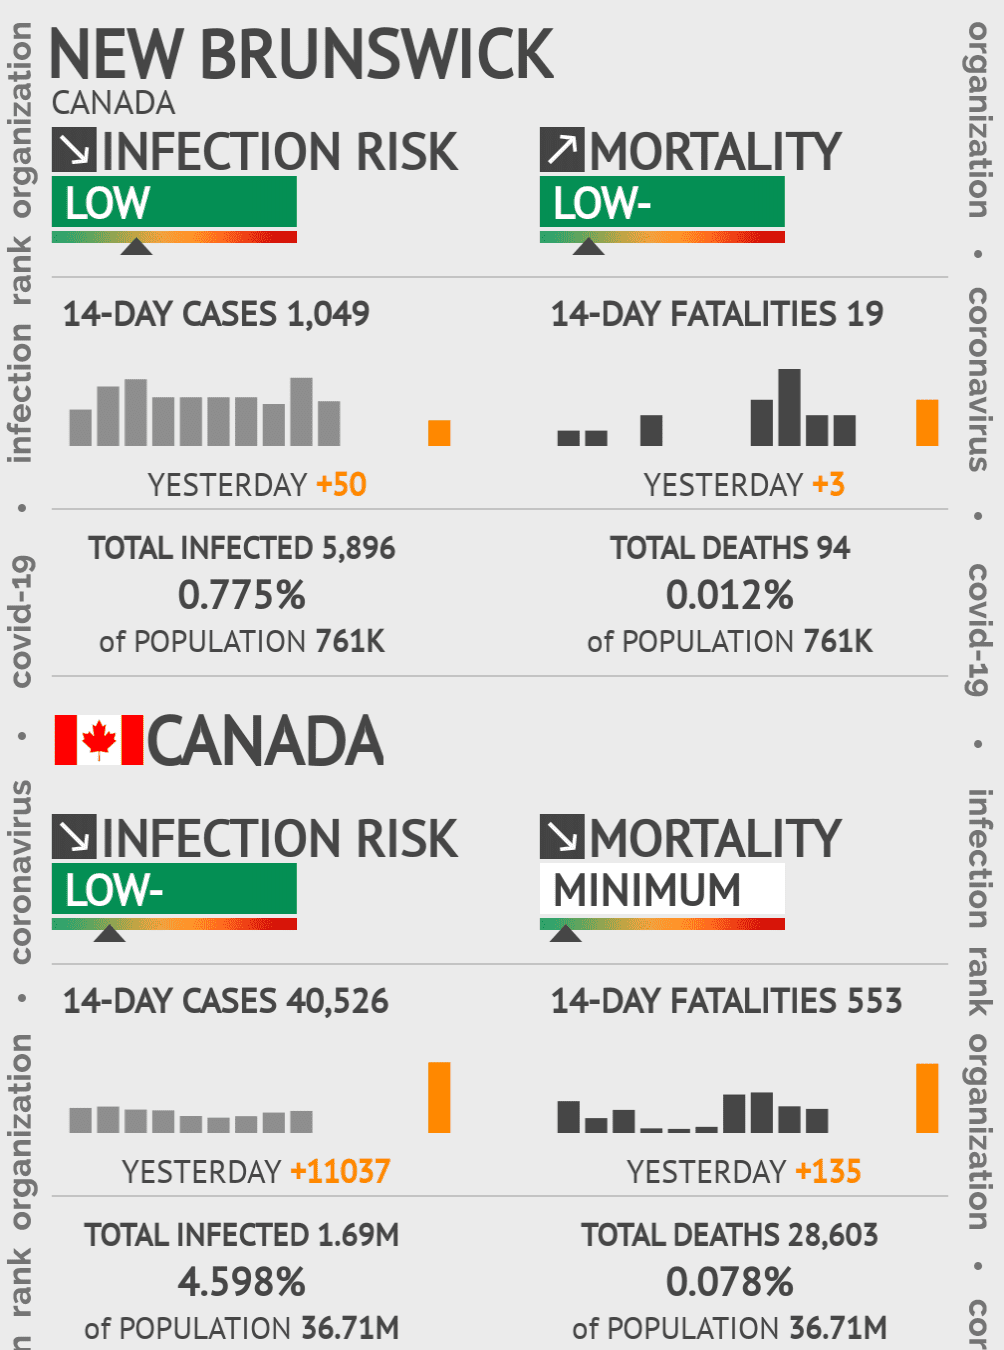 New Brunswick Coronavirus Covid-19 Risk of Infection on March 02, 2021